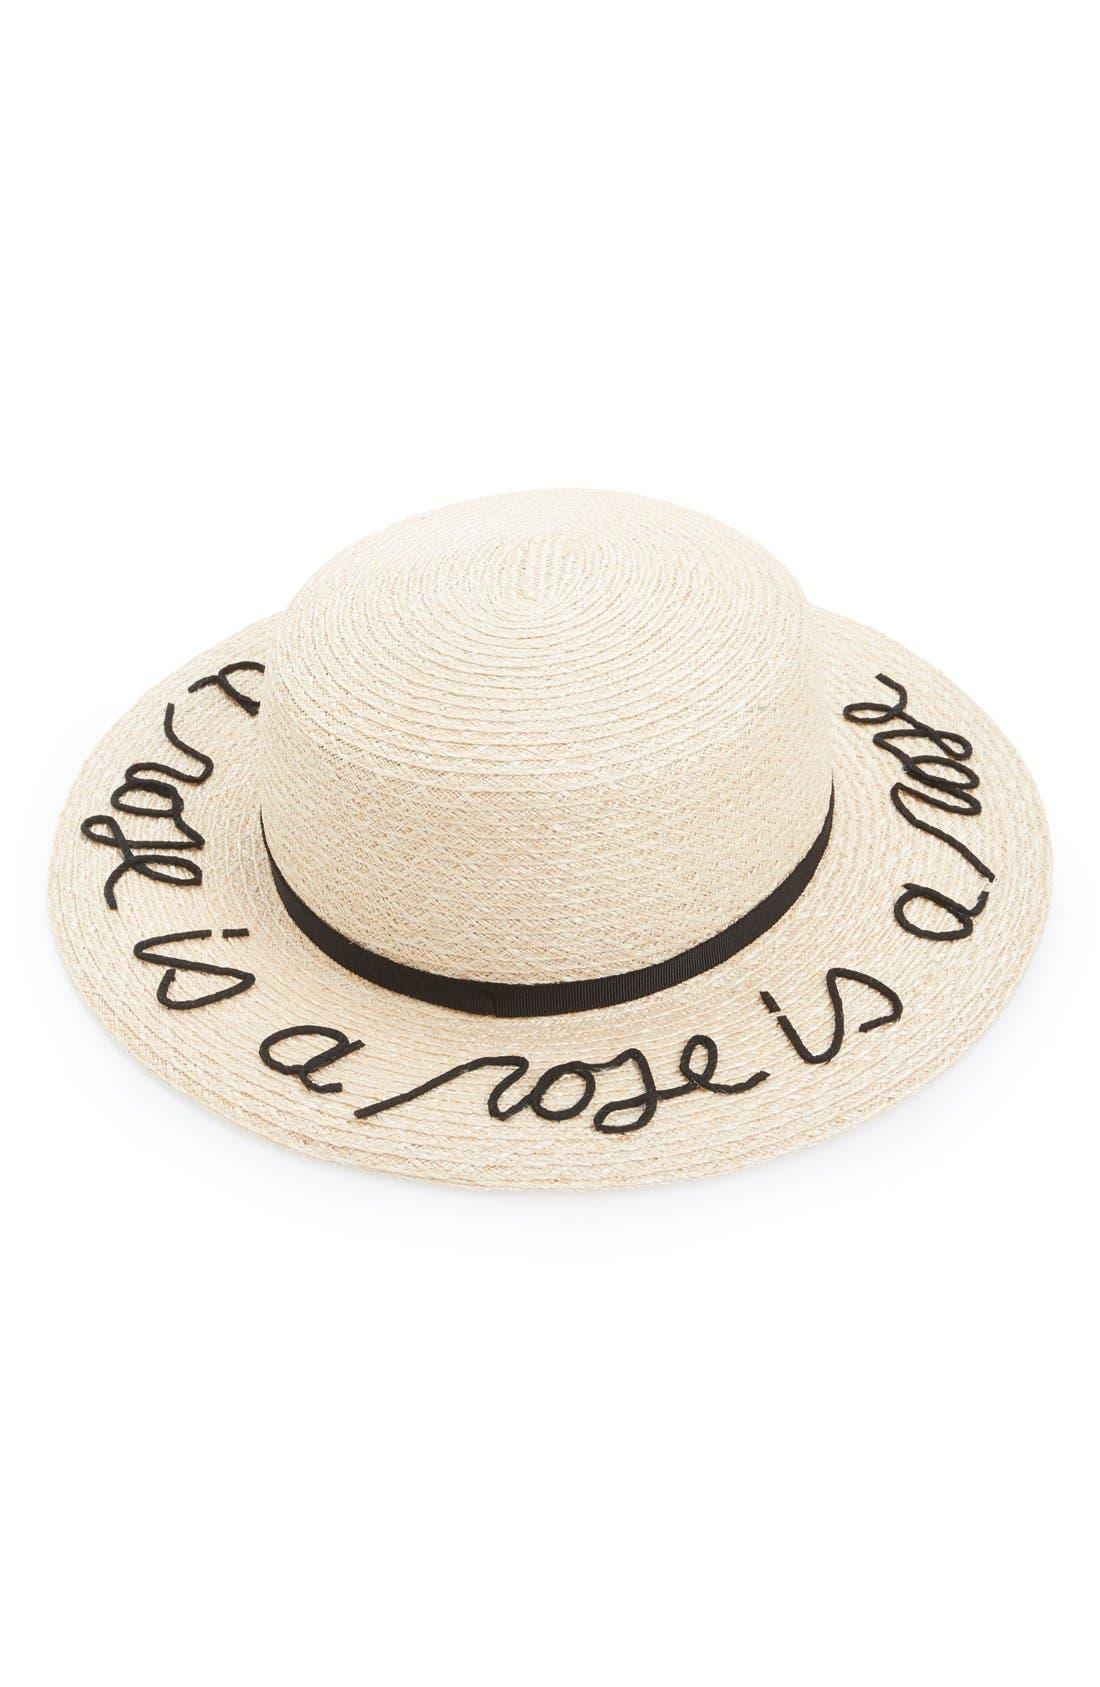 'Brigitte - A Rose is a Rose is a Rose' Hemp & Cotton Boater Hat,                         Main,                         color, 250